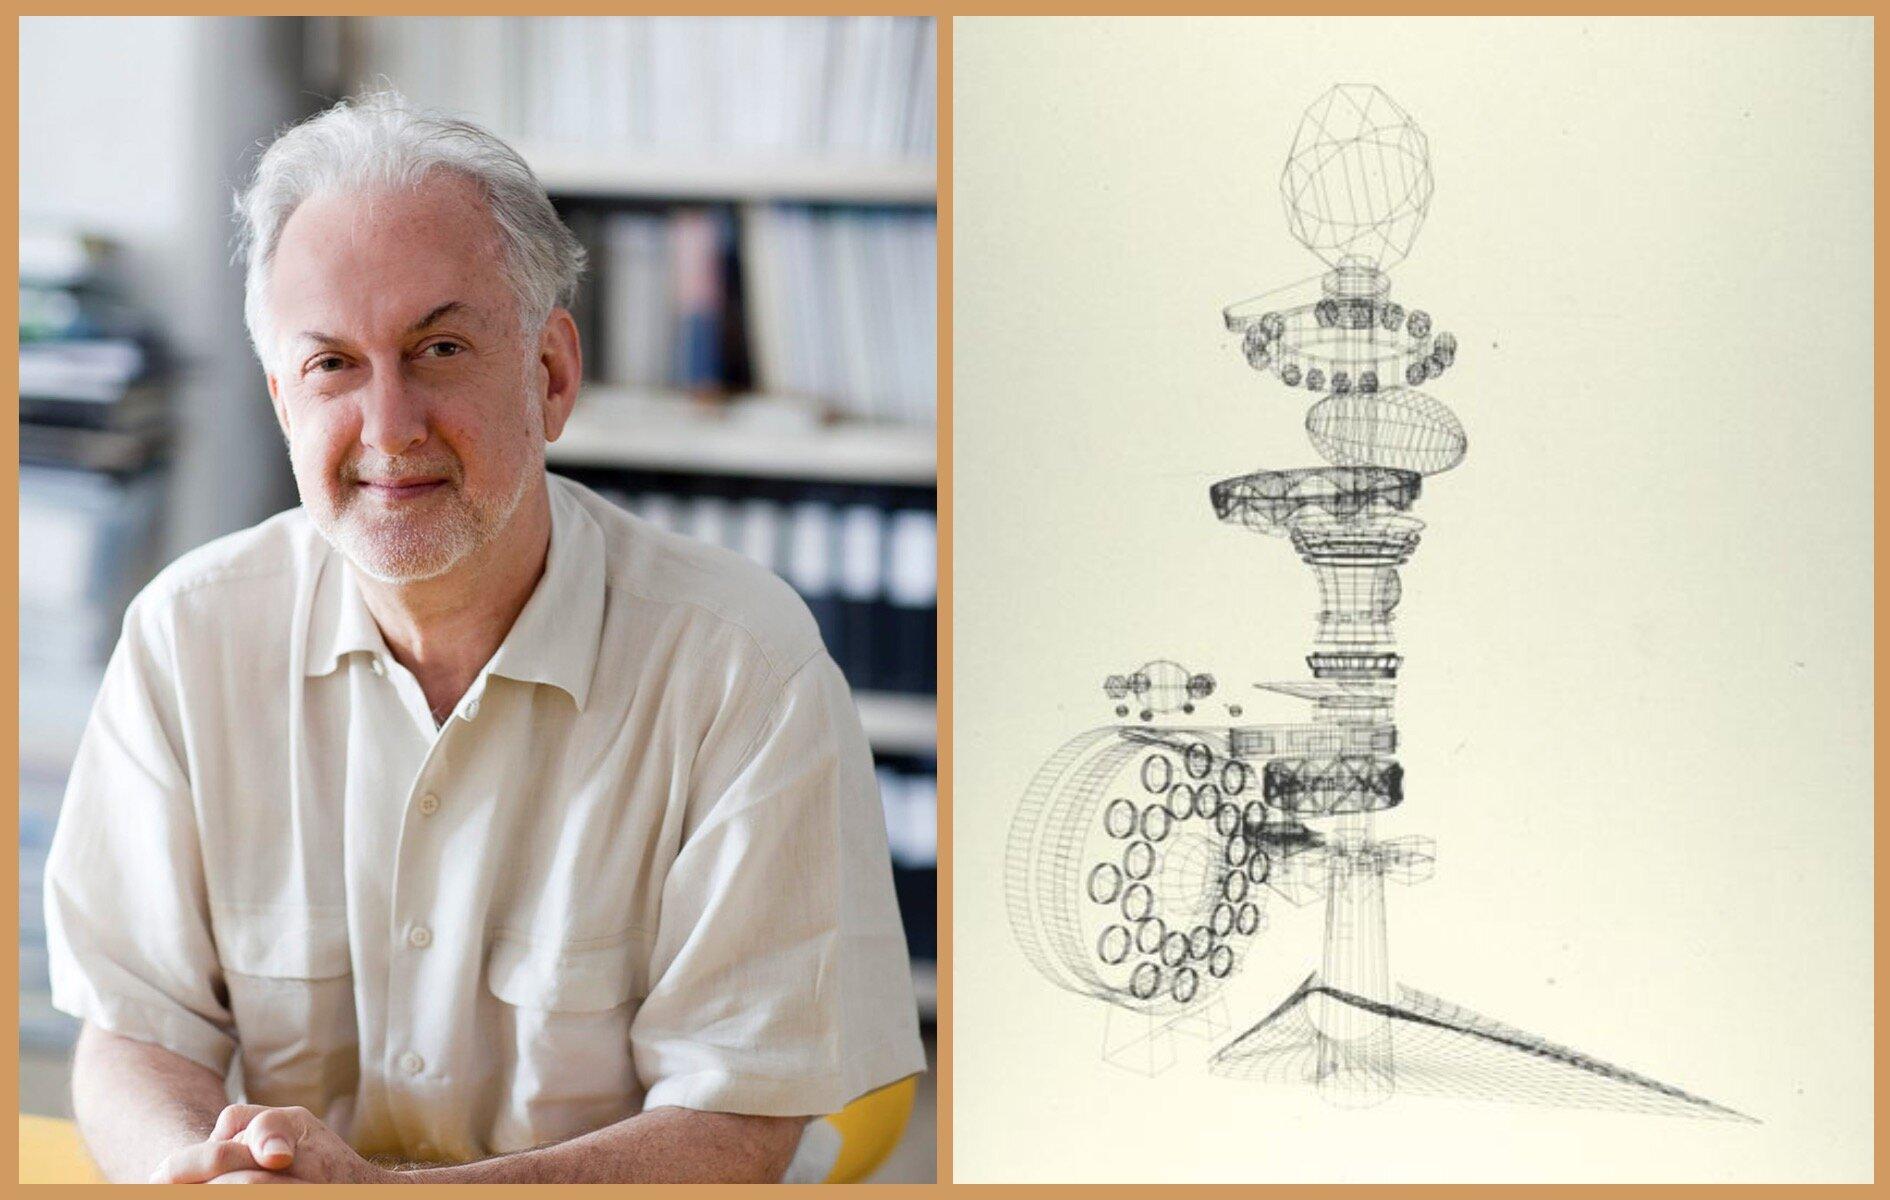 Архітектор Майкл Соркін помер від коронавірусу